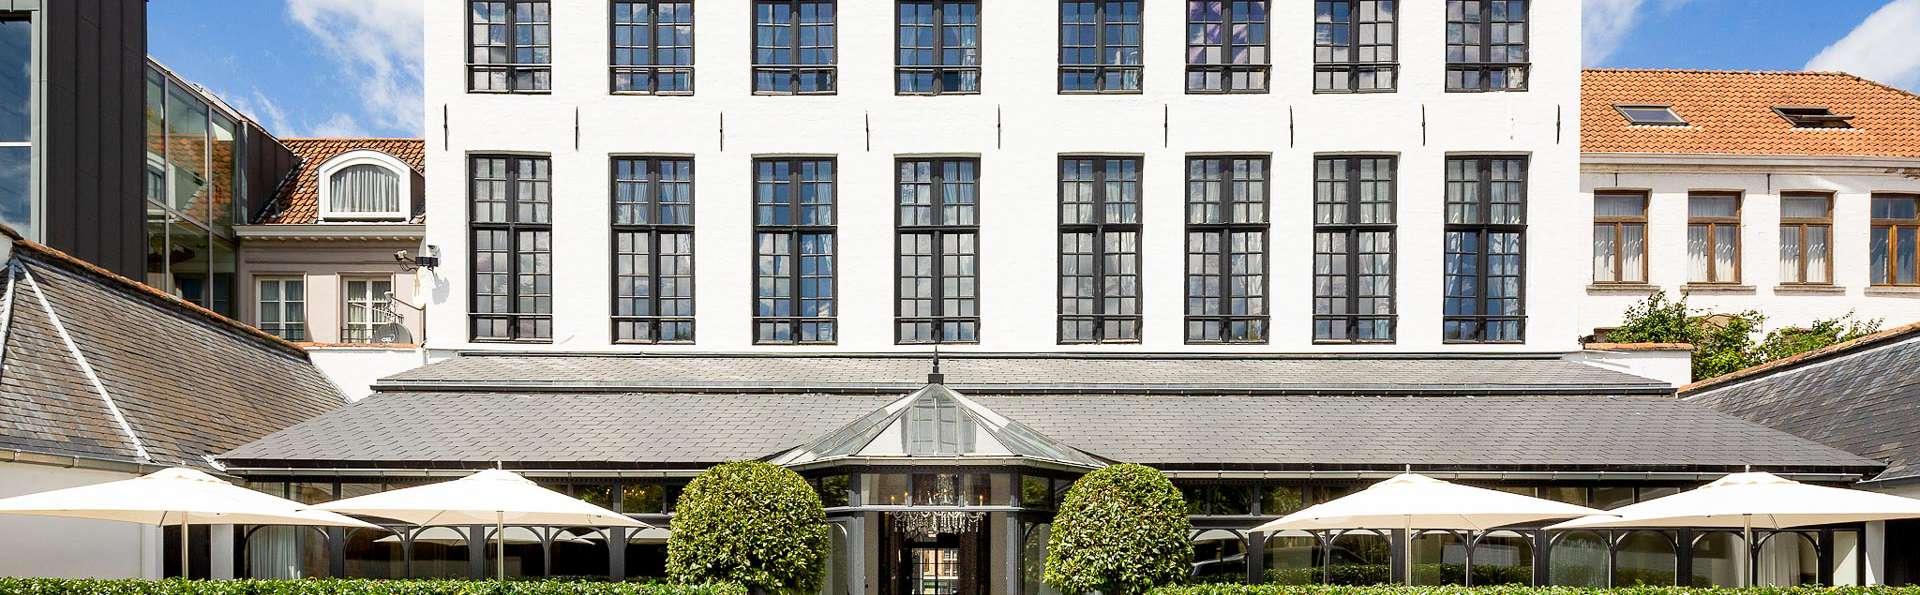 Hotel de Tuilerieen - EDIT_N2_FRONT_01.jpg